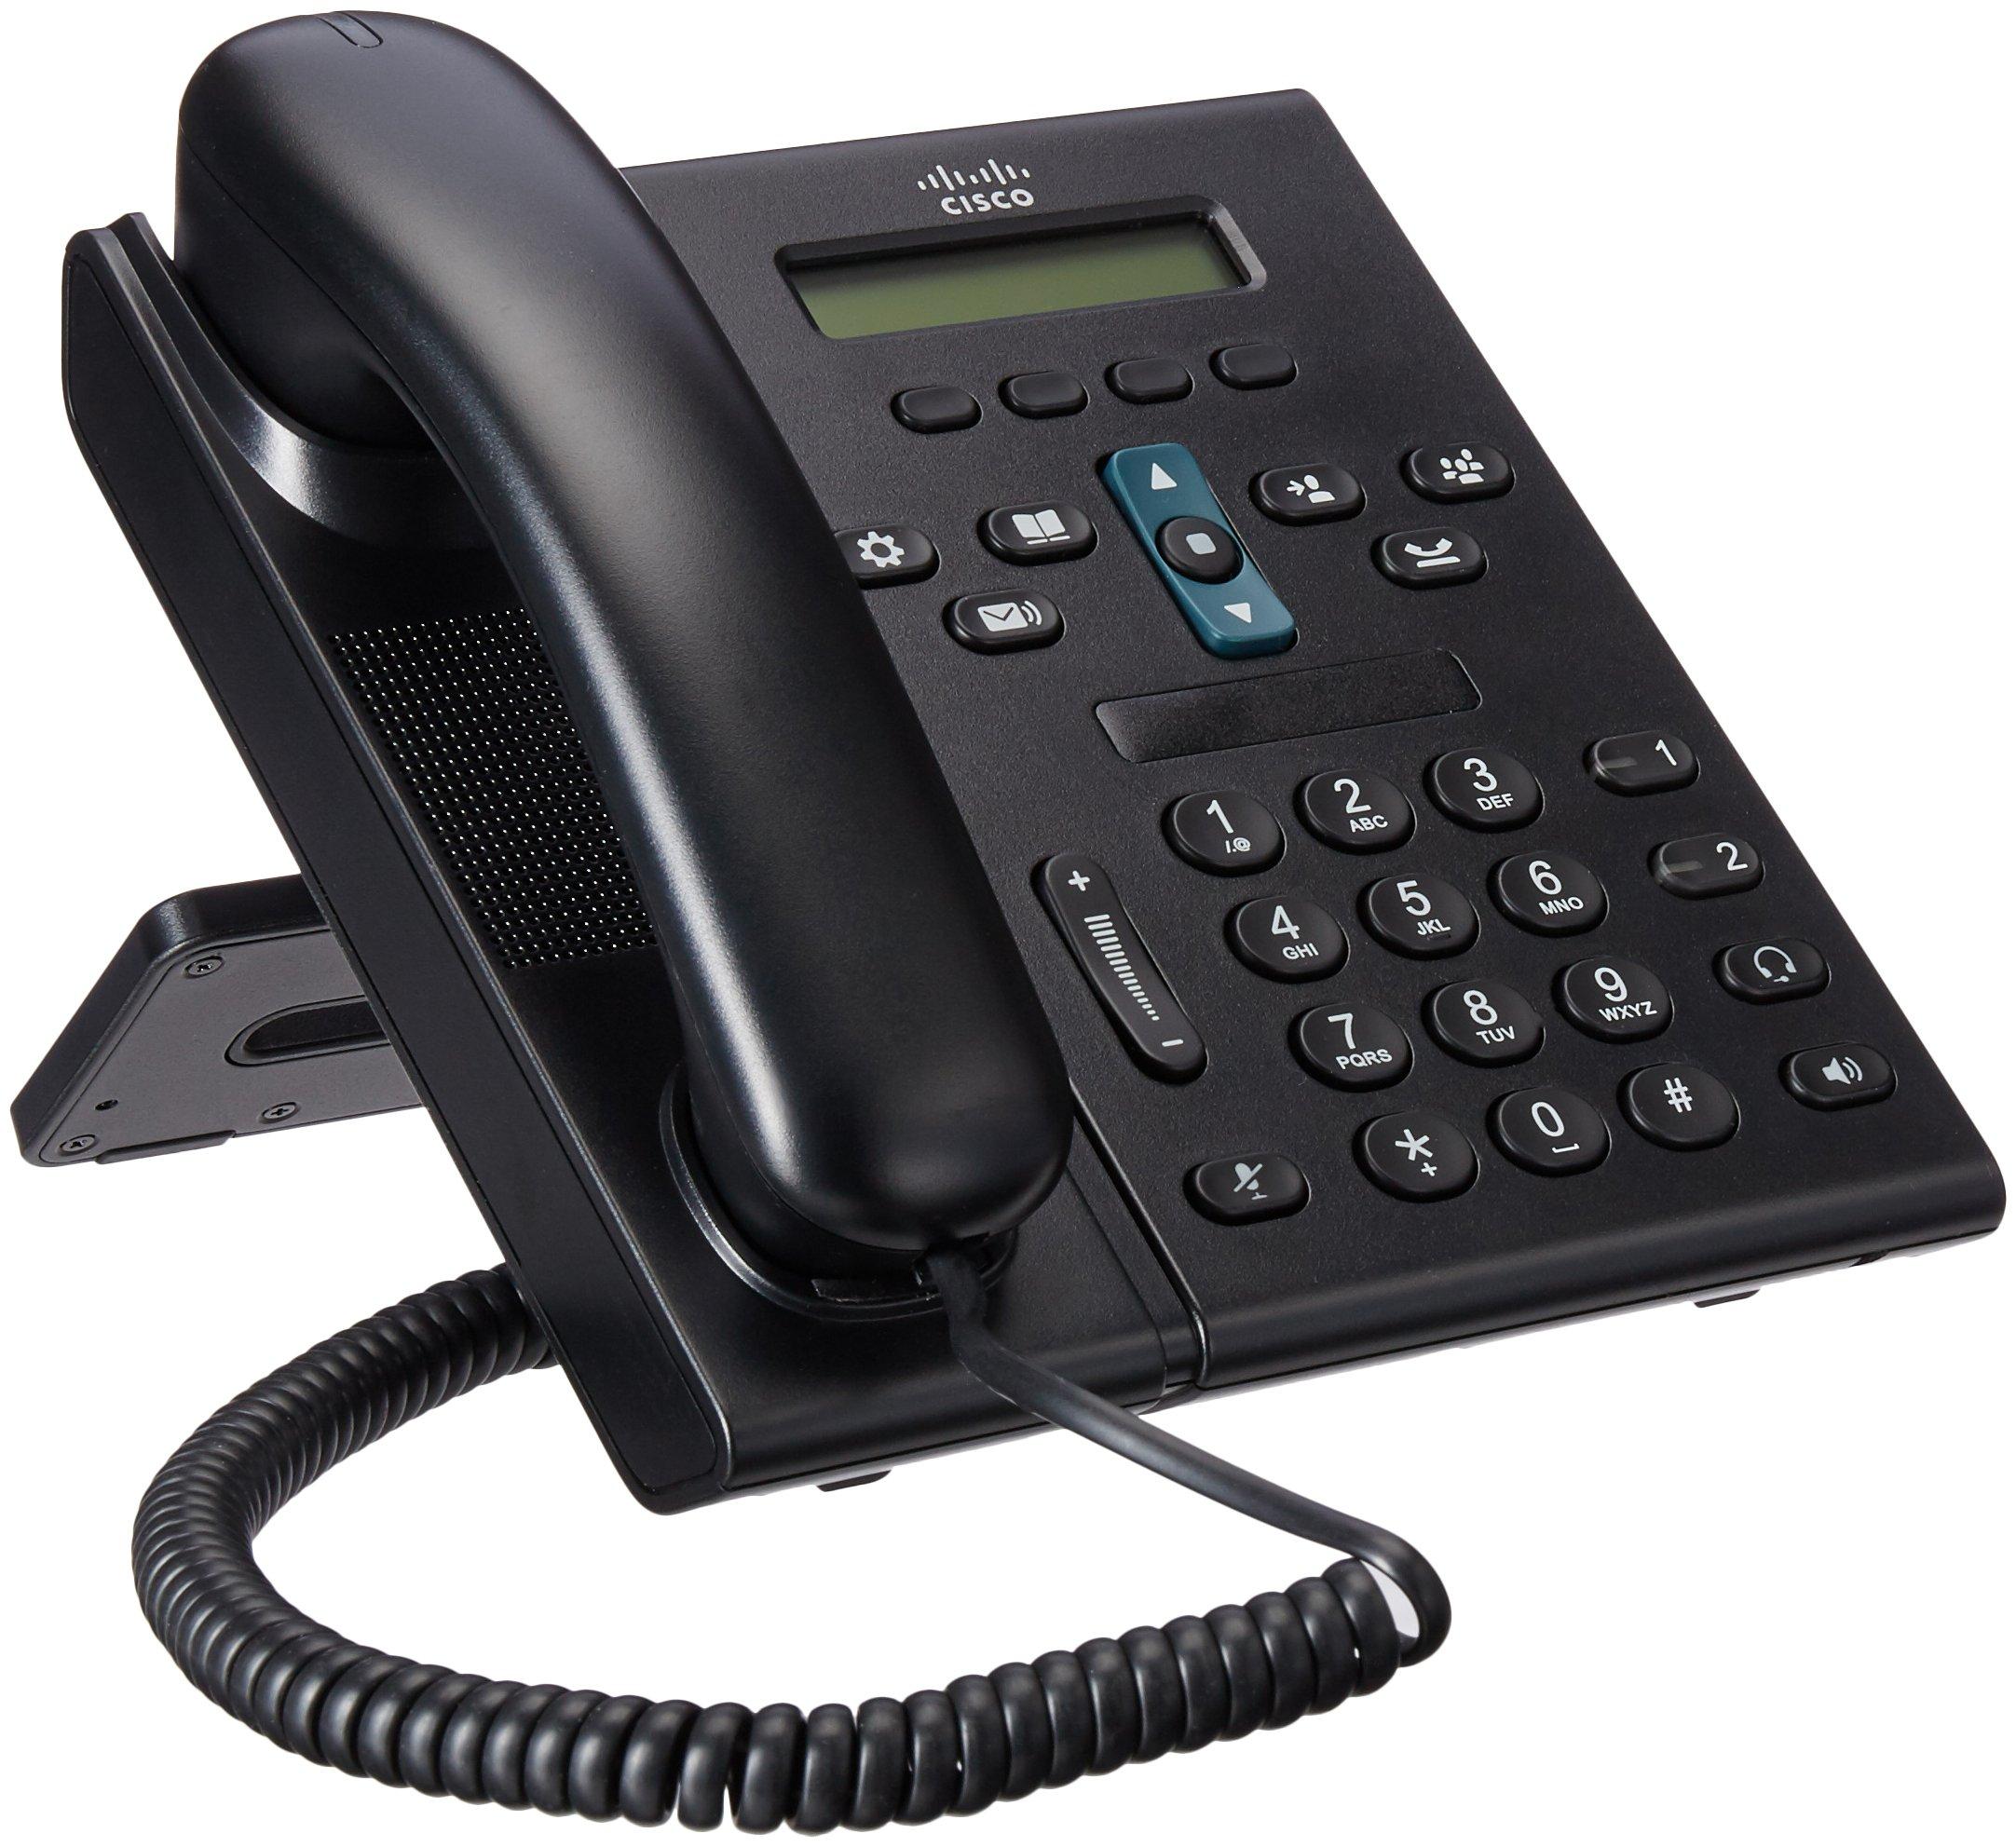 Cisco CP 6921  2-Line Office VoIP Phone (CP-6921-C-K9) by Cisco